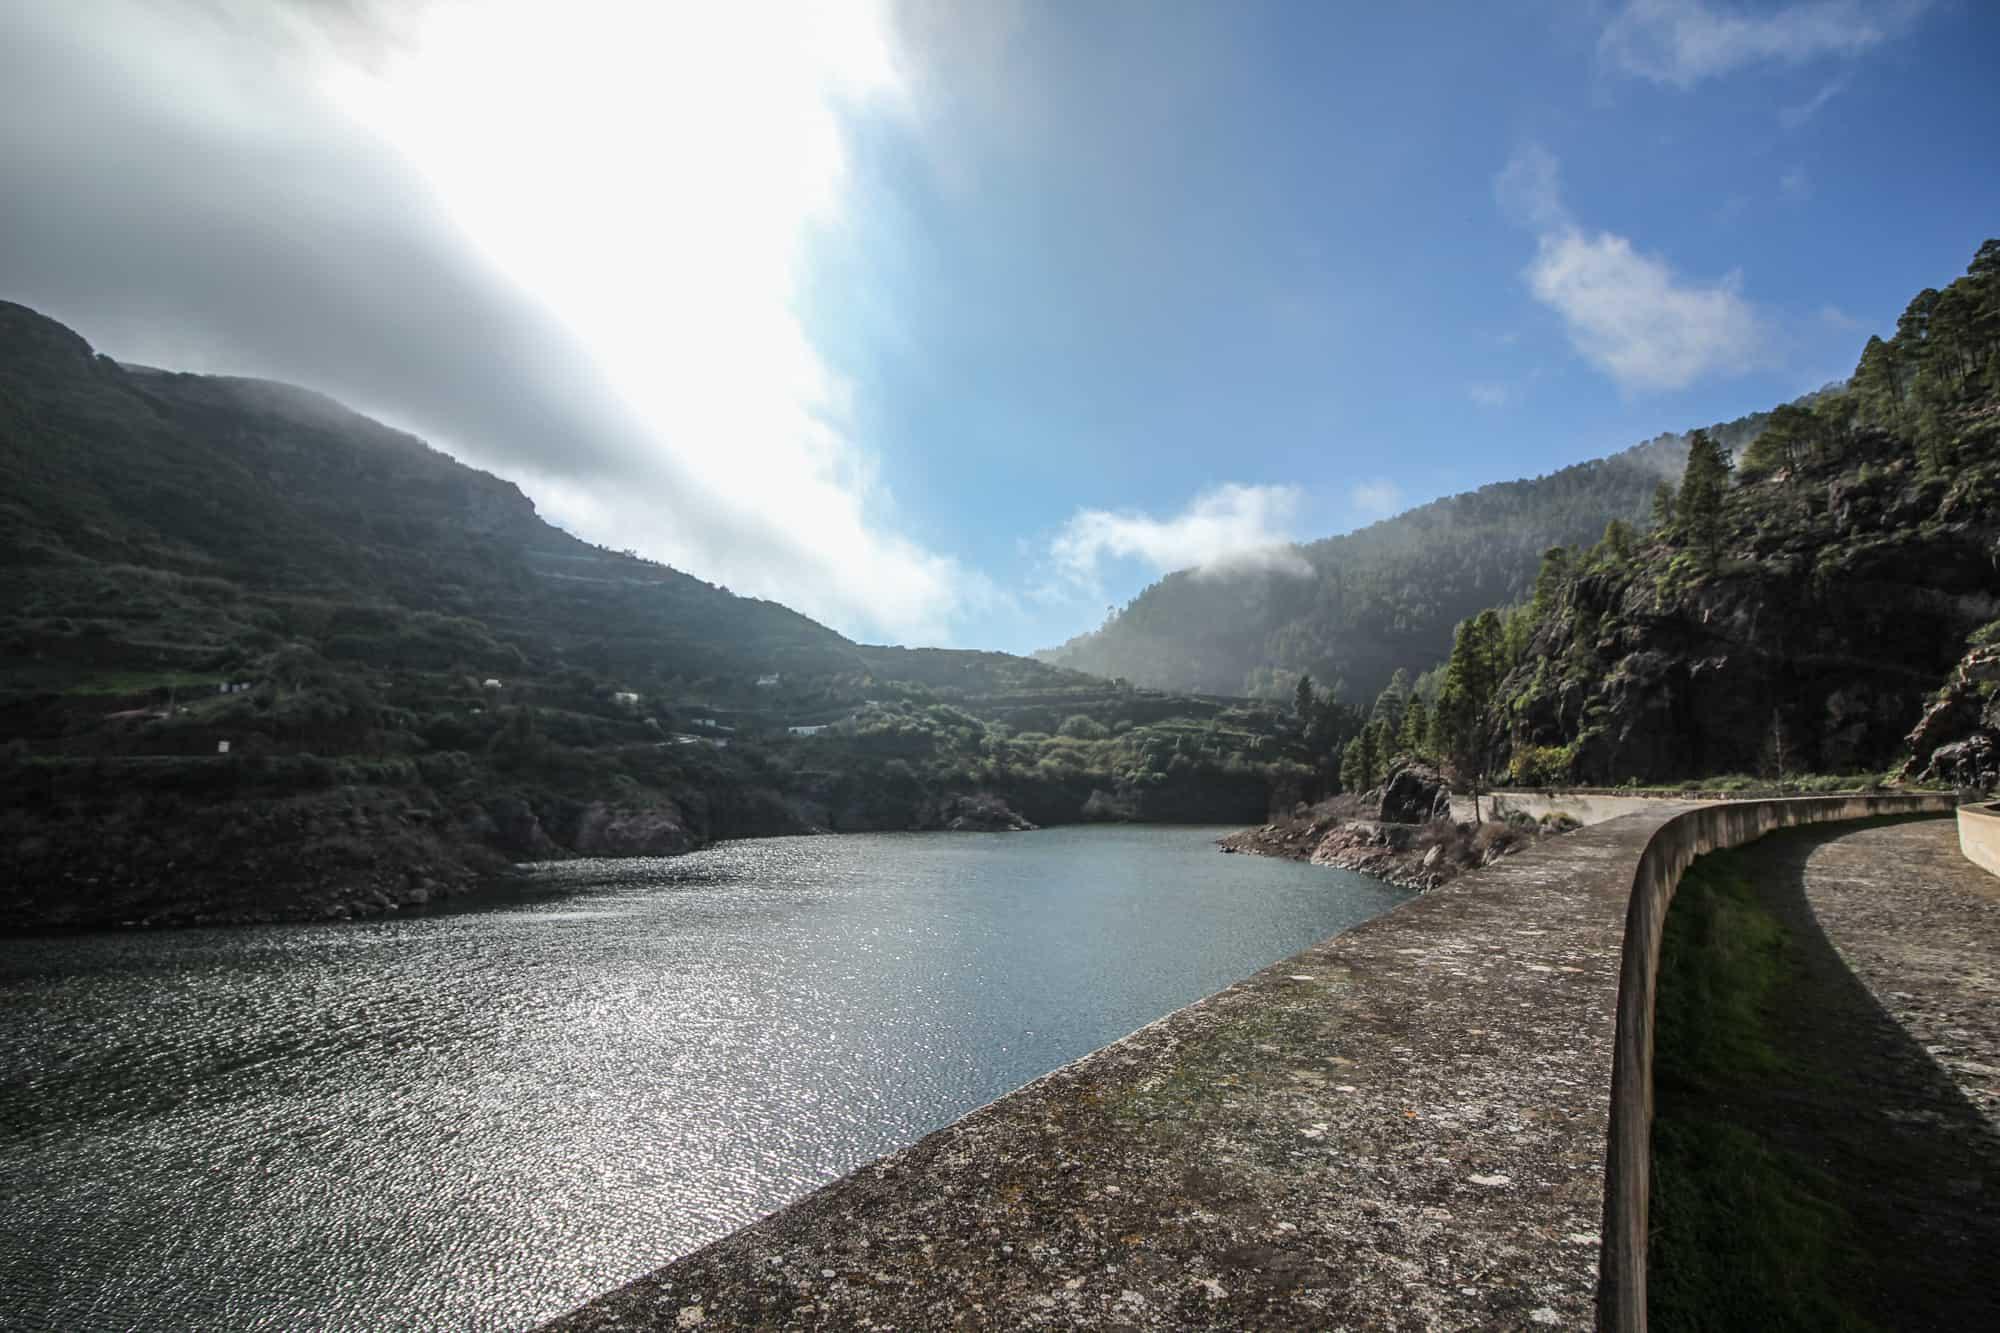 Wandern Artenara Stausee Lugarejo